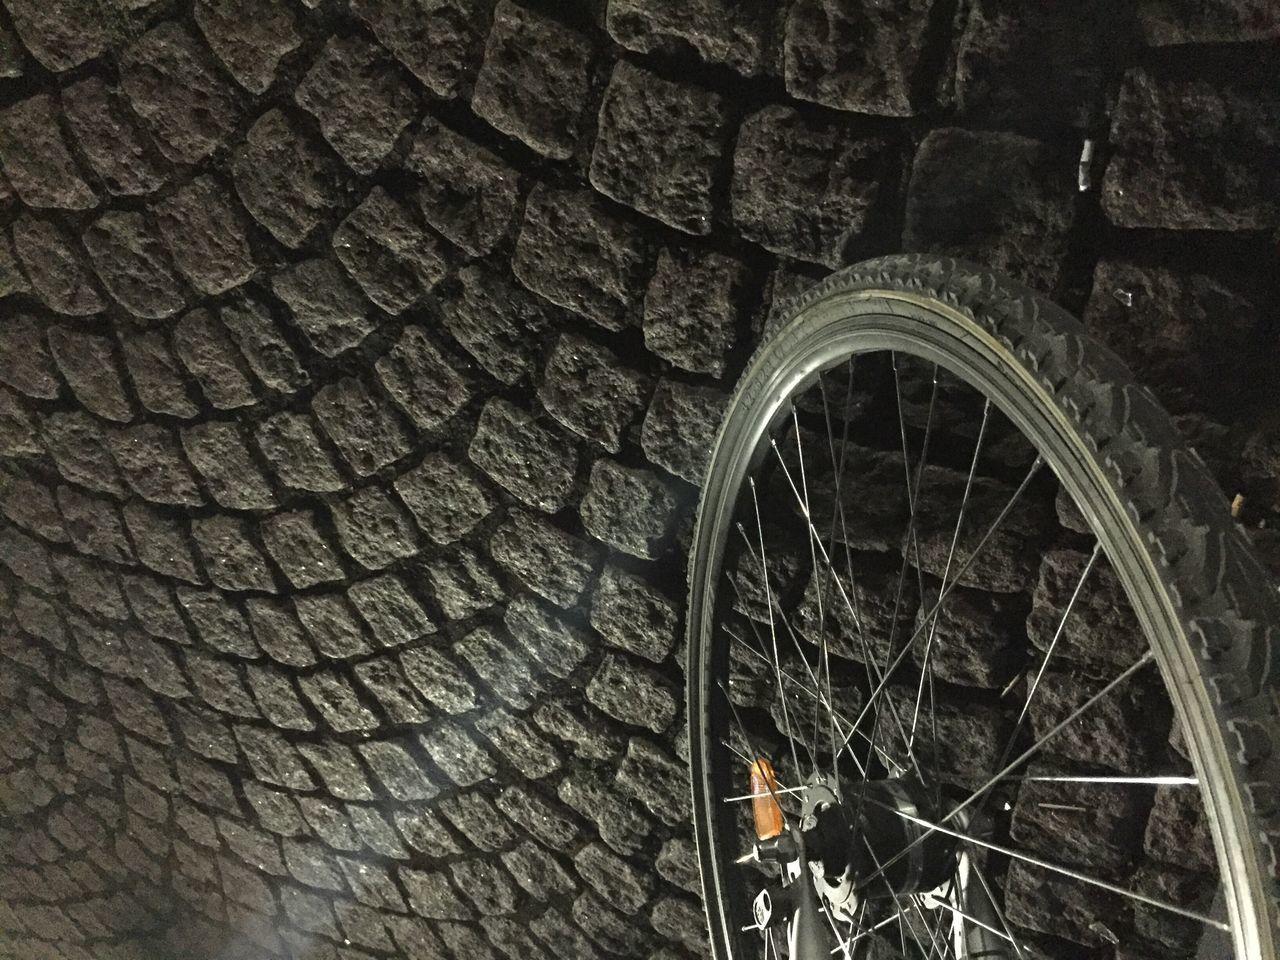 Bicycle Stone Outdoors Mobilephotography Outdoor Photography Bike Wheel Shadow Beam Night Nightphotography KopfSteinPflaster